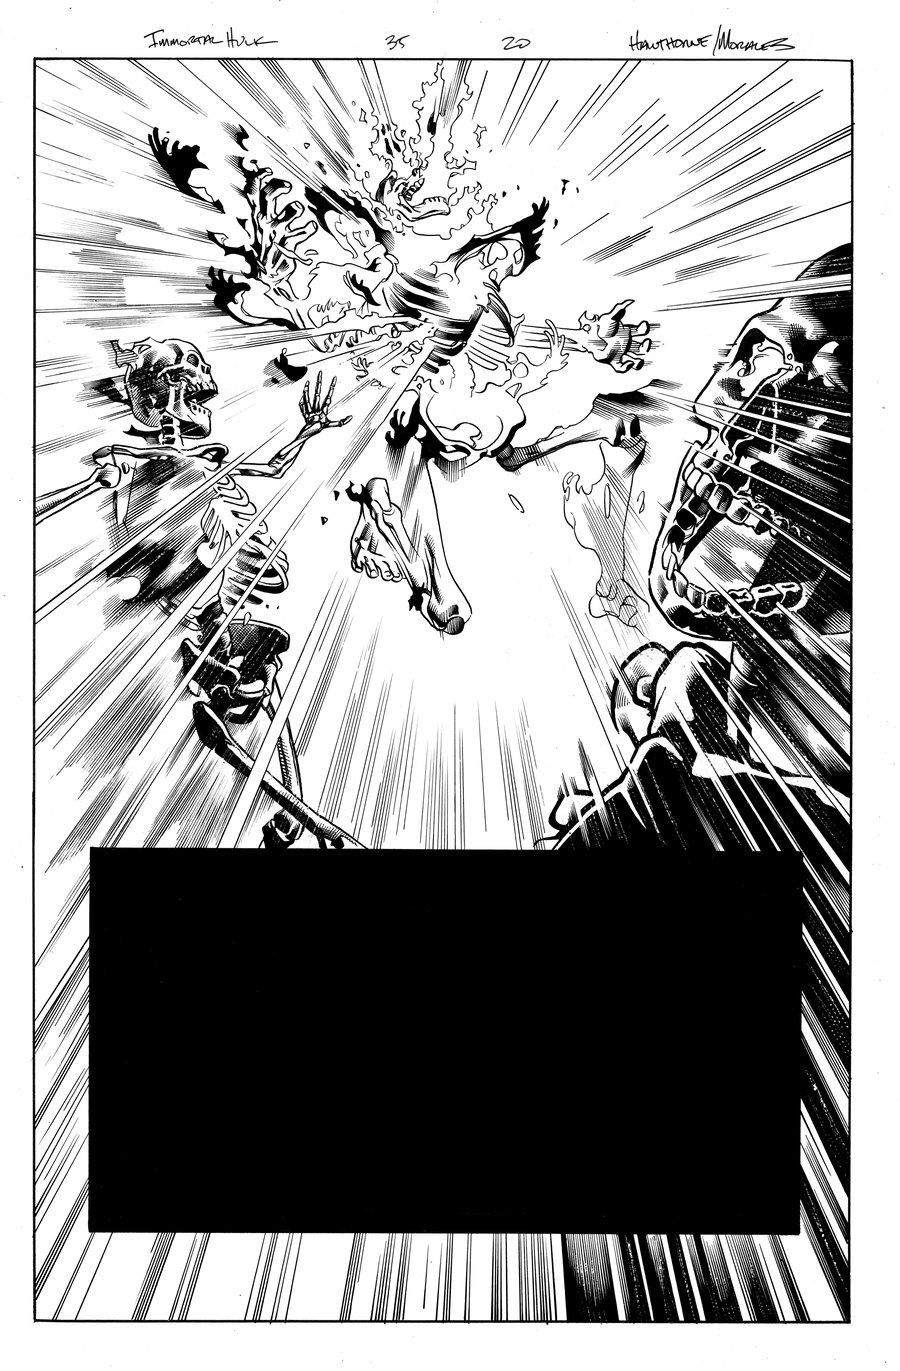 Image of Immortal Hulk (2020) #35 PG 20